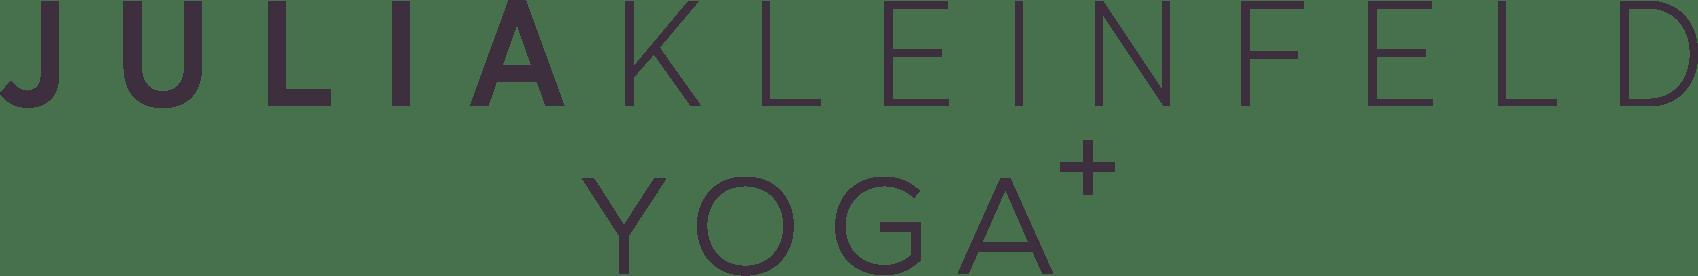 Julia Kleinfeld Yoga+